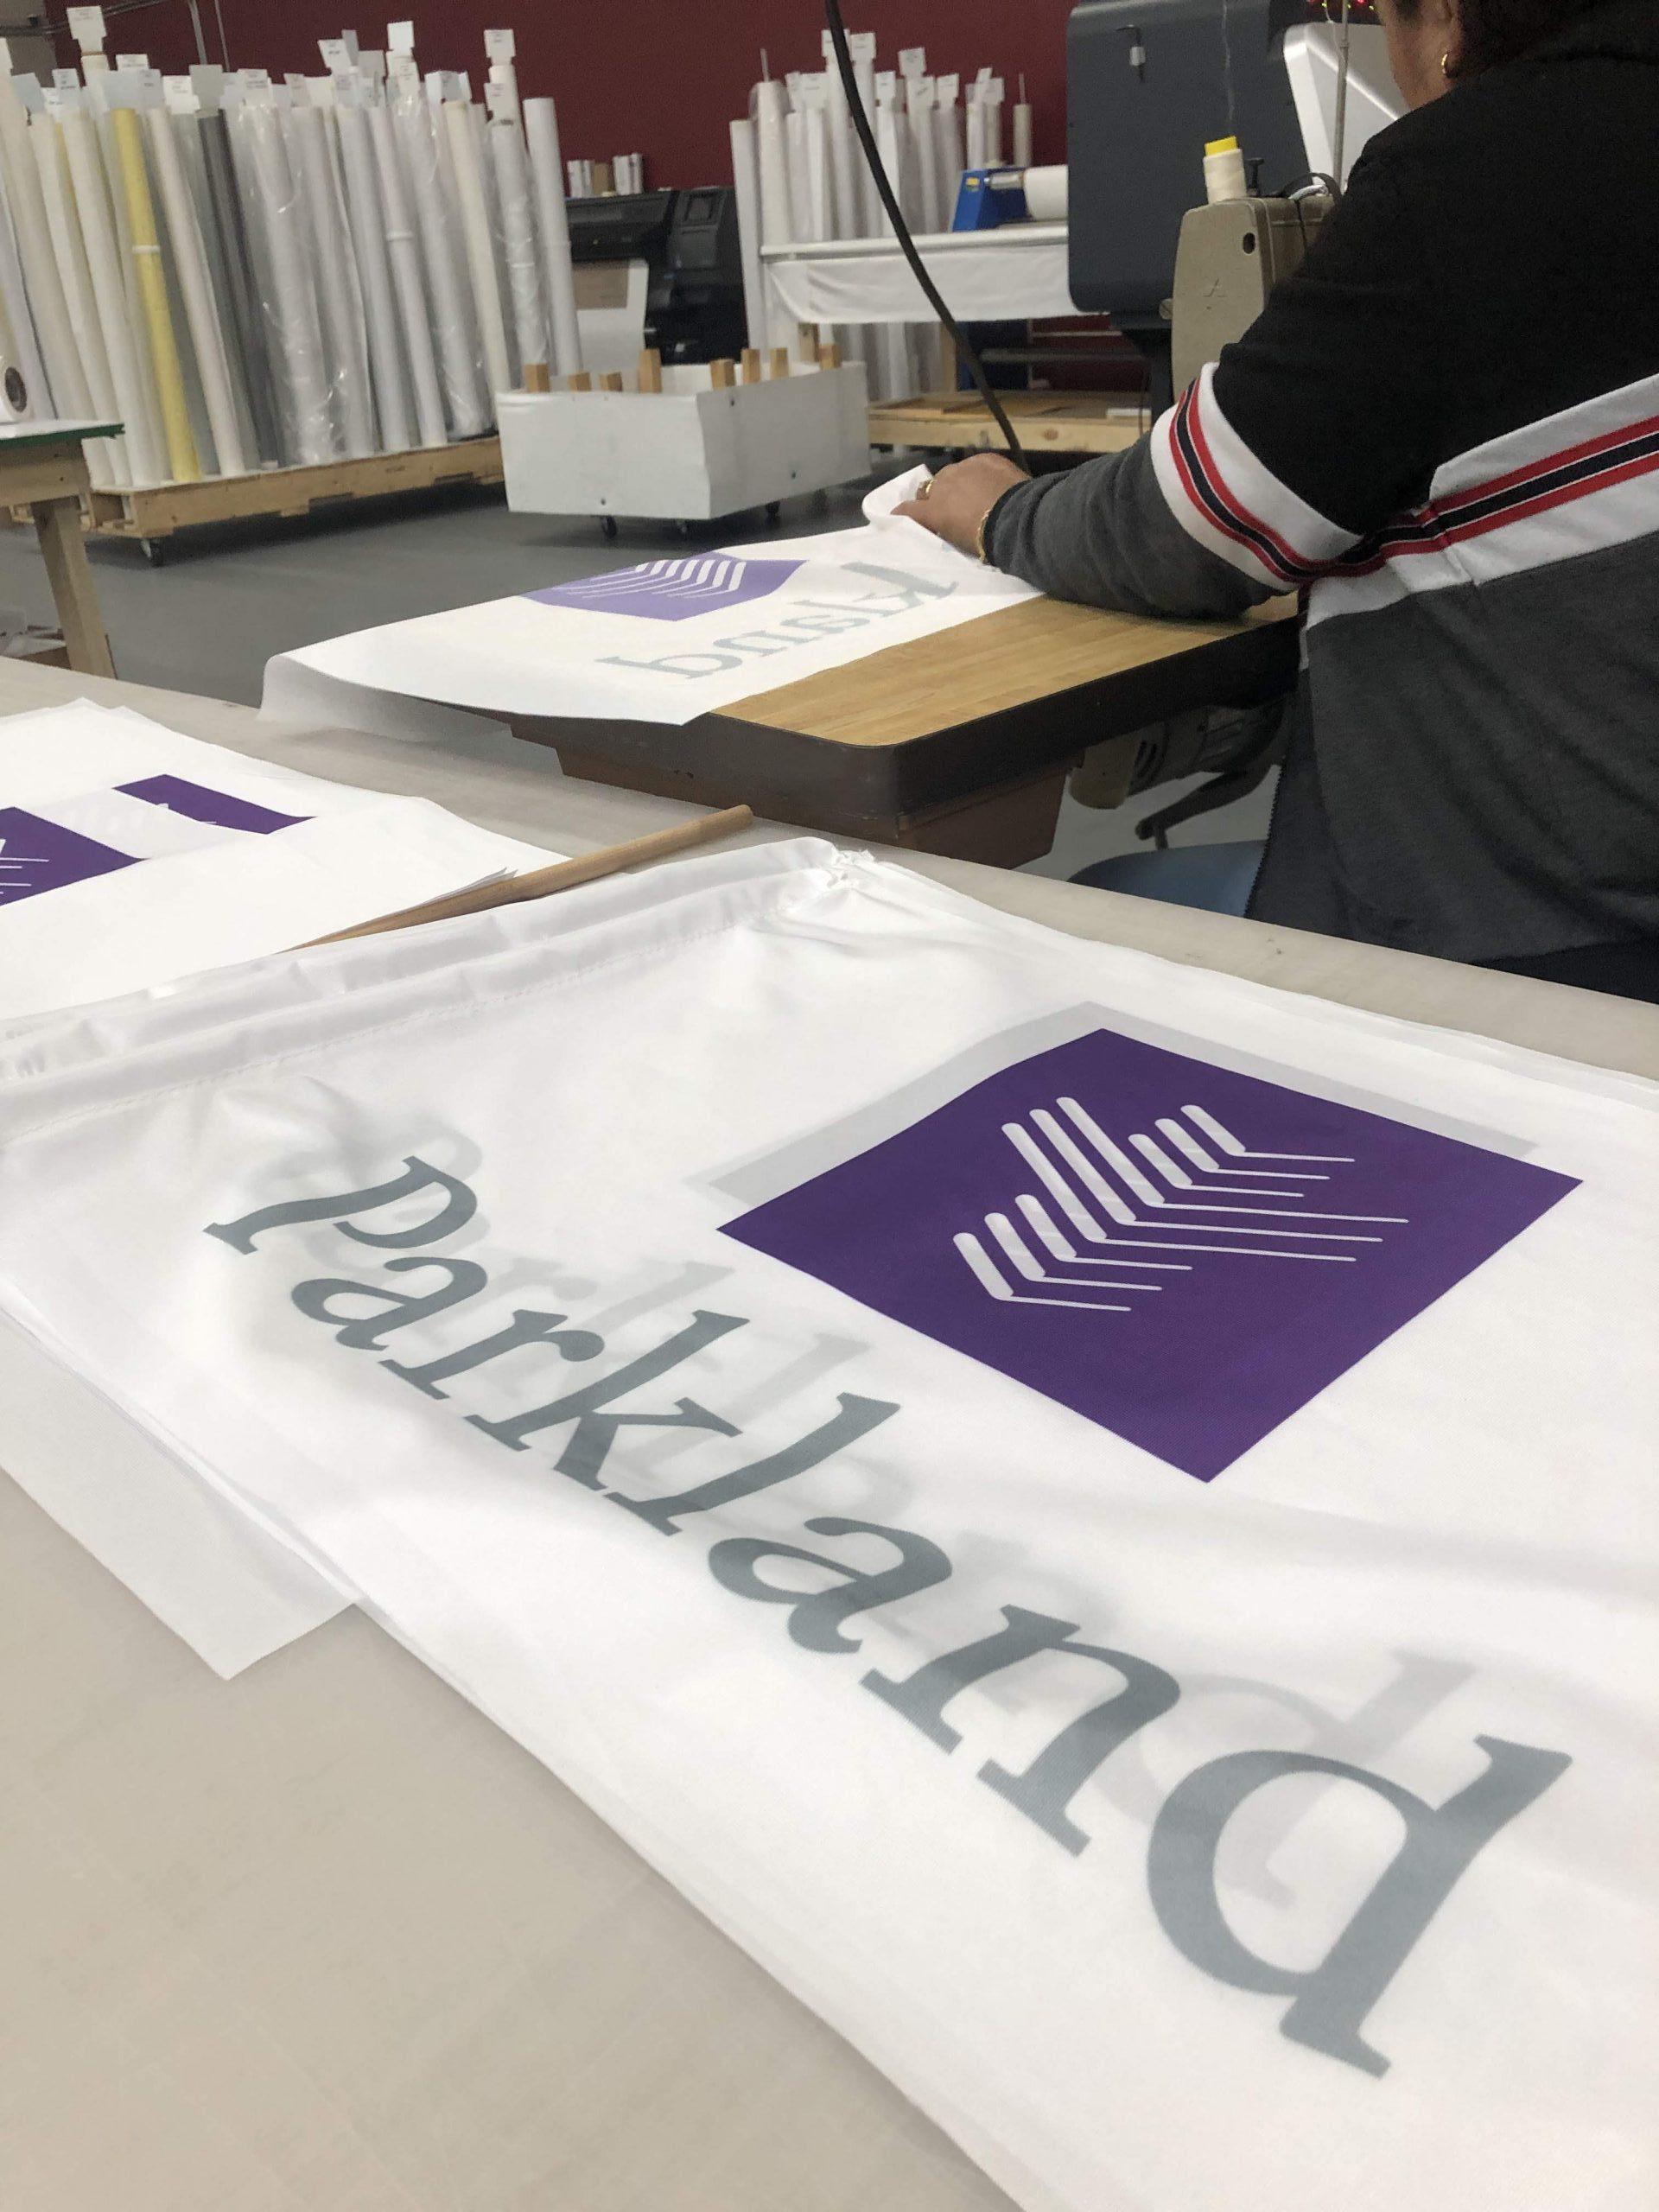 Printed flags